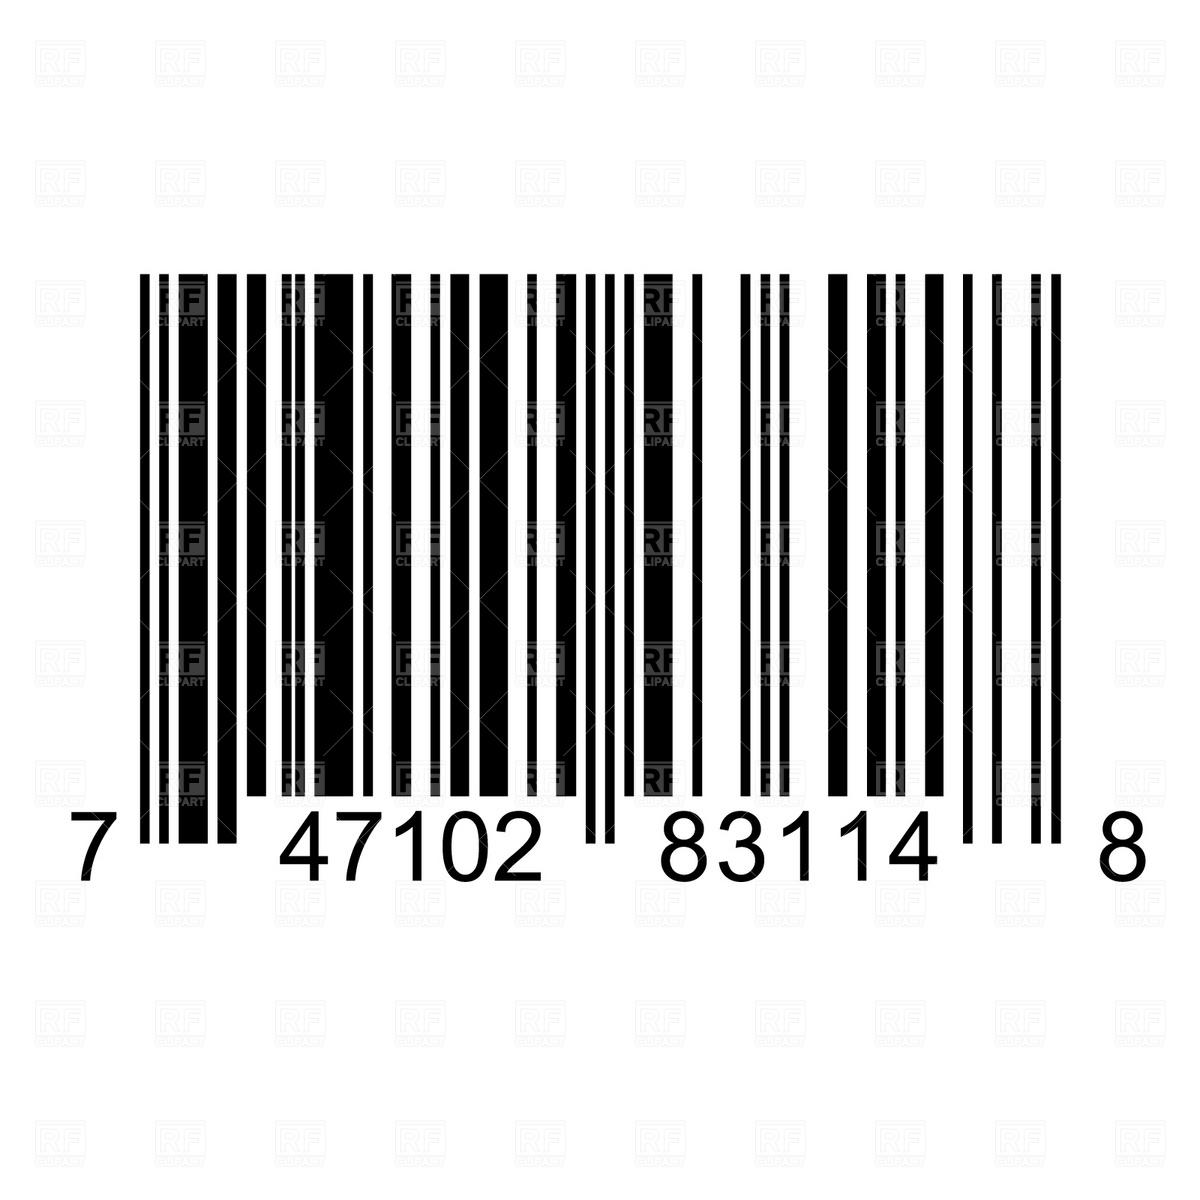 Barcode Cartoon Illustrations, Royalty-Free Vector